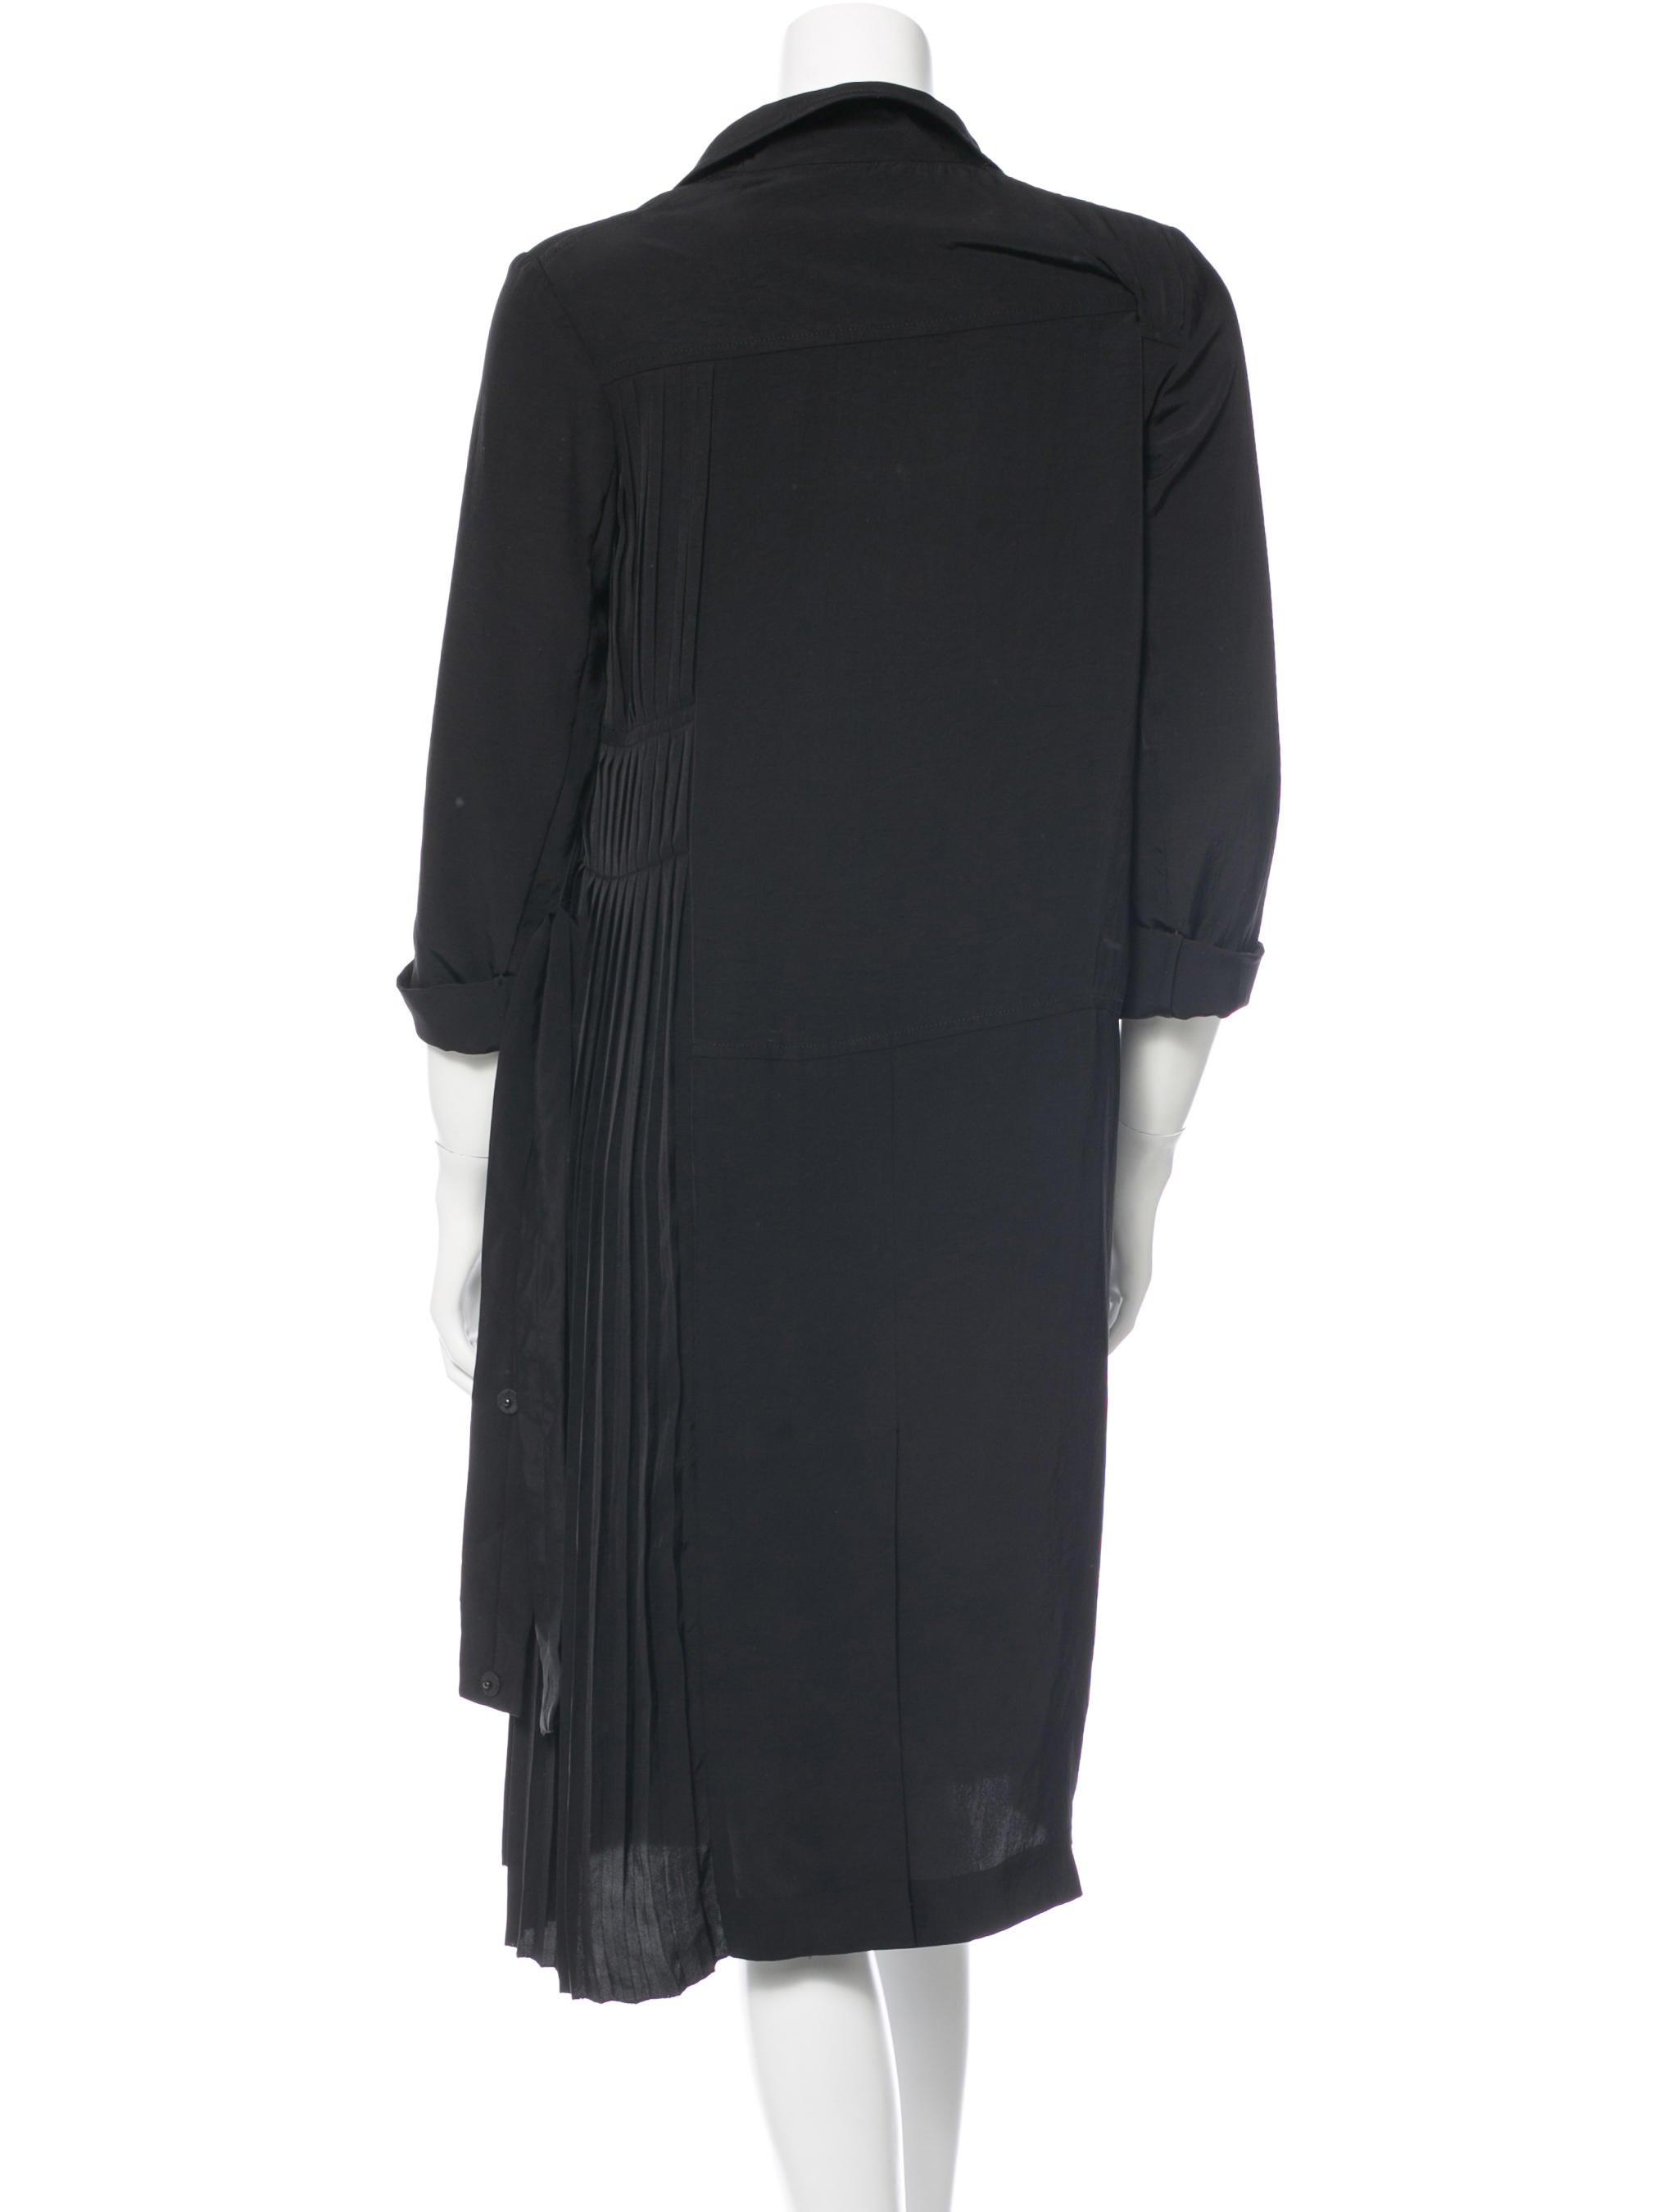 Prada pleated shirt dress clothing pra90161 the realreal for Black pleated dress shirt